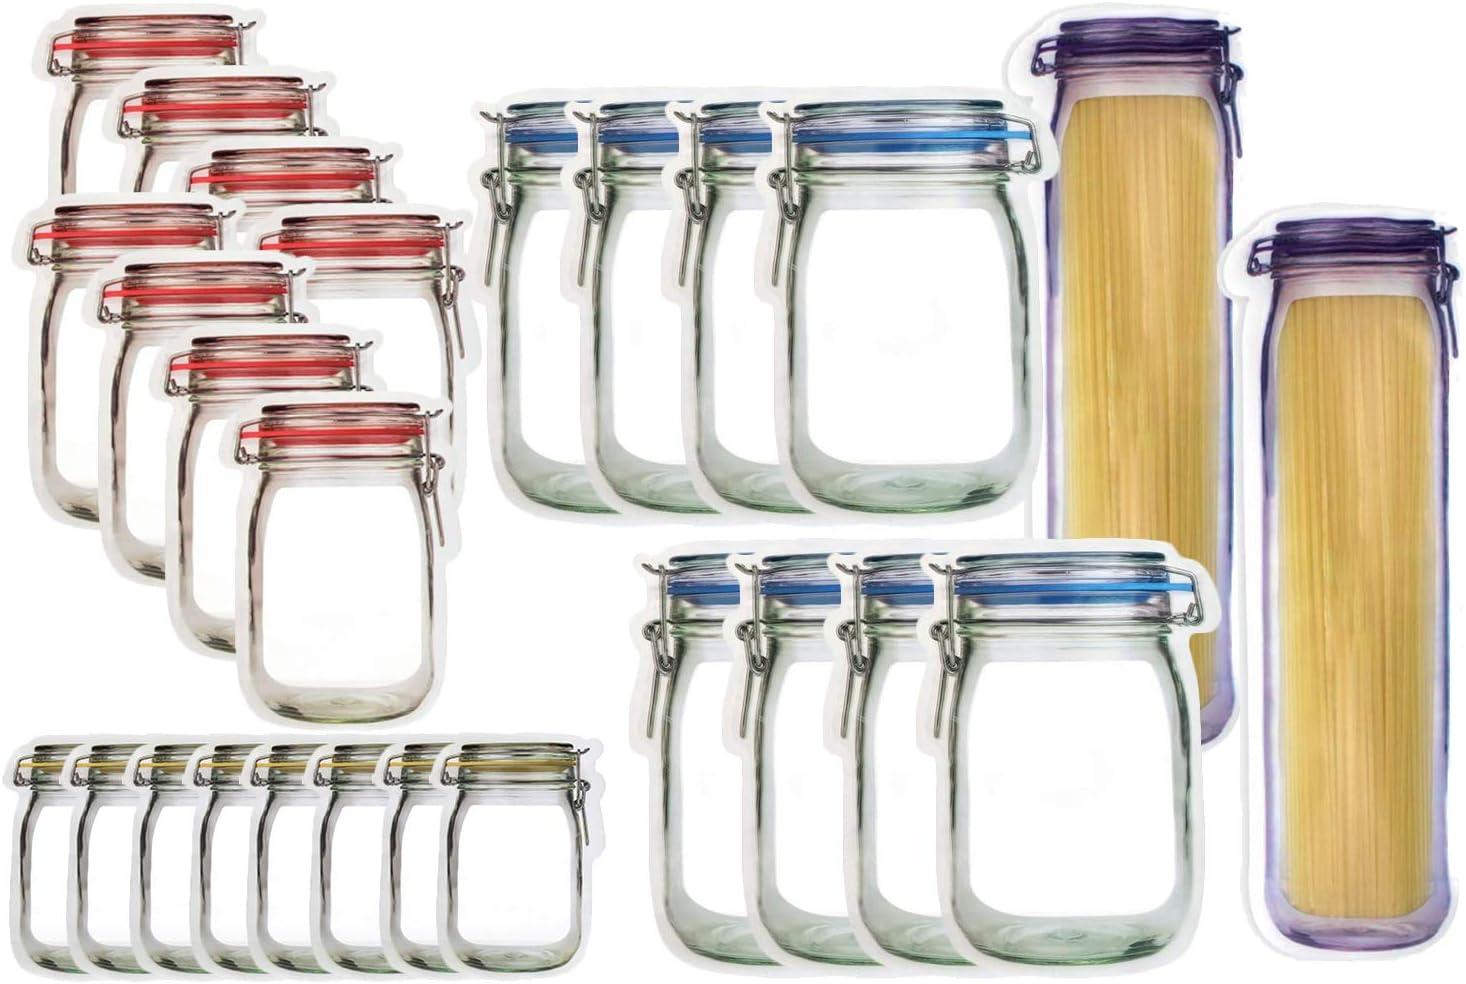 JOERSH 26PCS Mason Jar Bottles Bags Reusable Stand-Up Ziplock Food Snack Storage Bags Fresh Sealed Bags for Kitchen Camping Picnic Organizer Travel Camping (S/M/L/Xl)